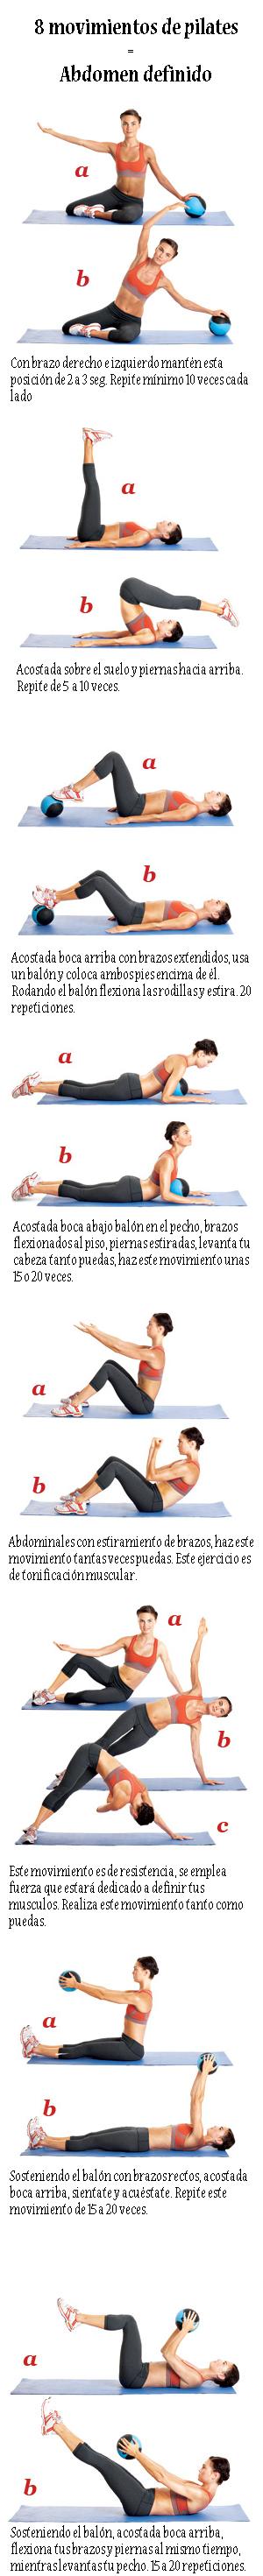 7 Movimientos De Pilates Para Un Abdomen Definido Pilates